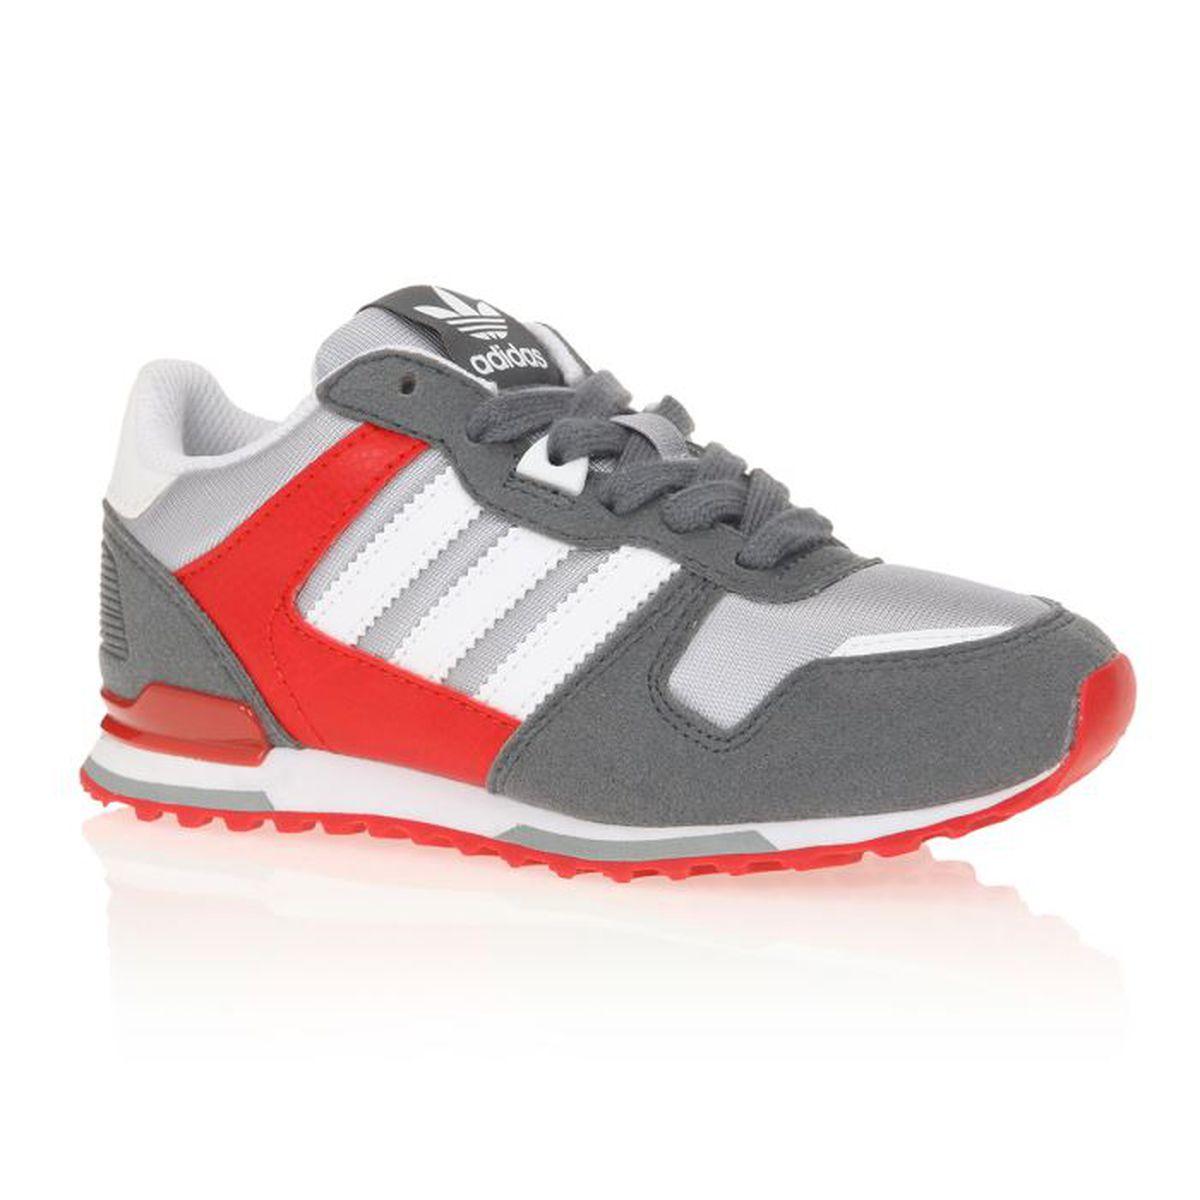 adidas zx 700 solde